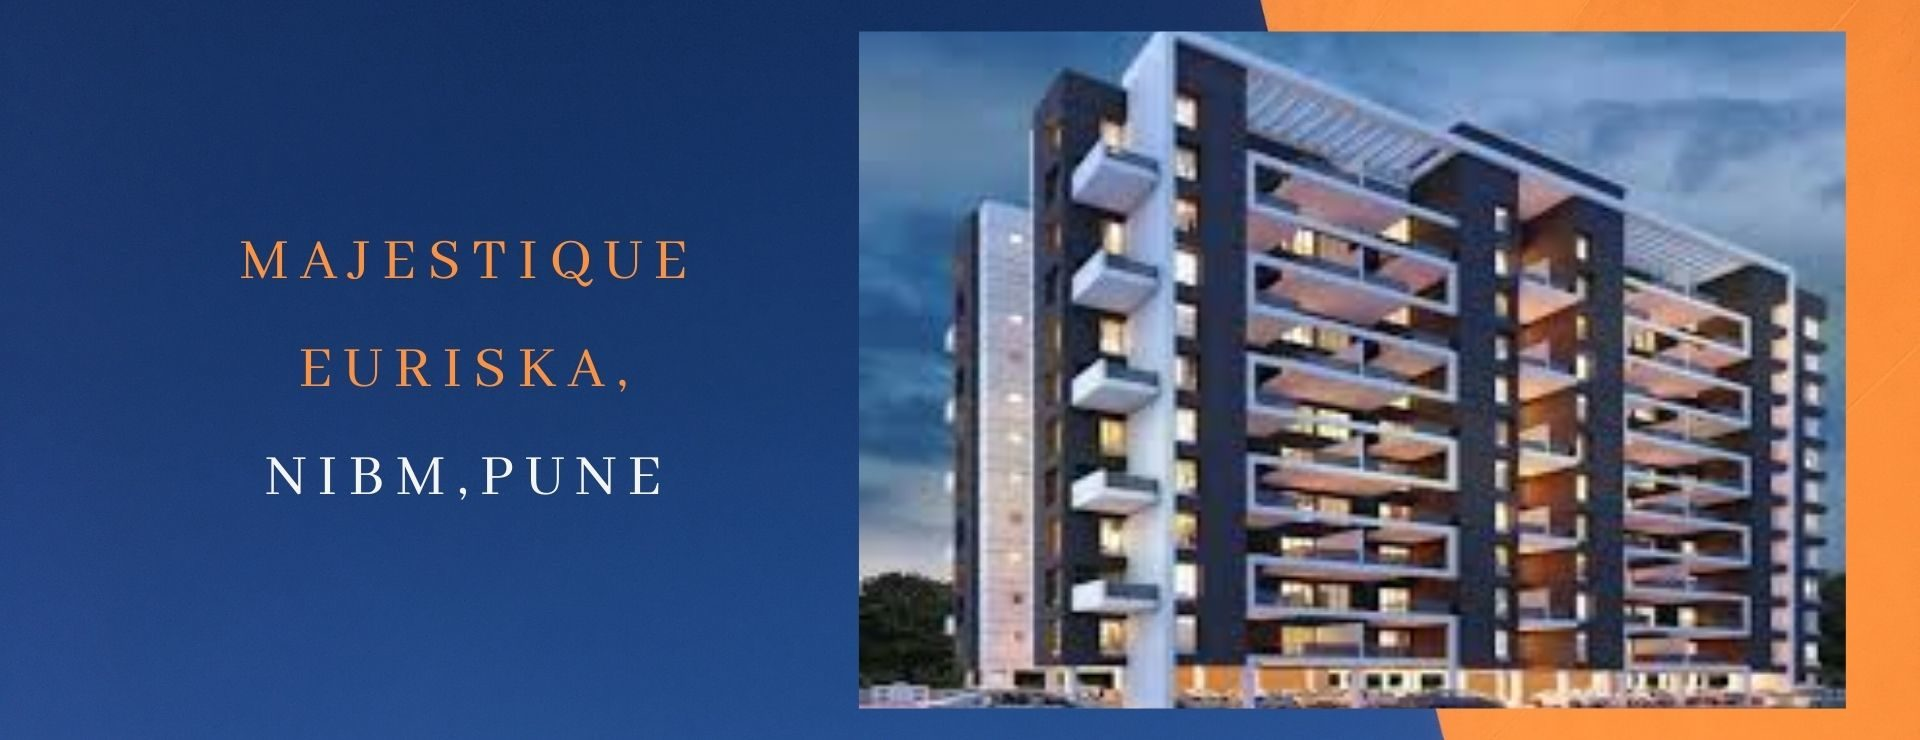 Majestique Euriska ,NIBM, Pune